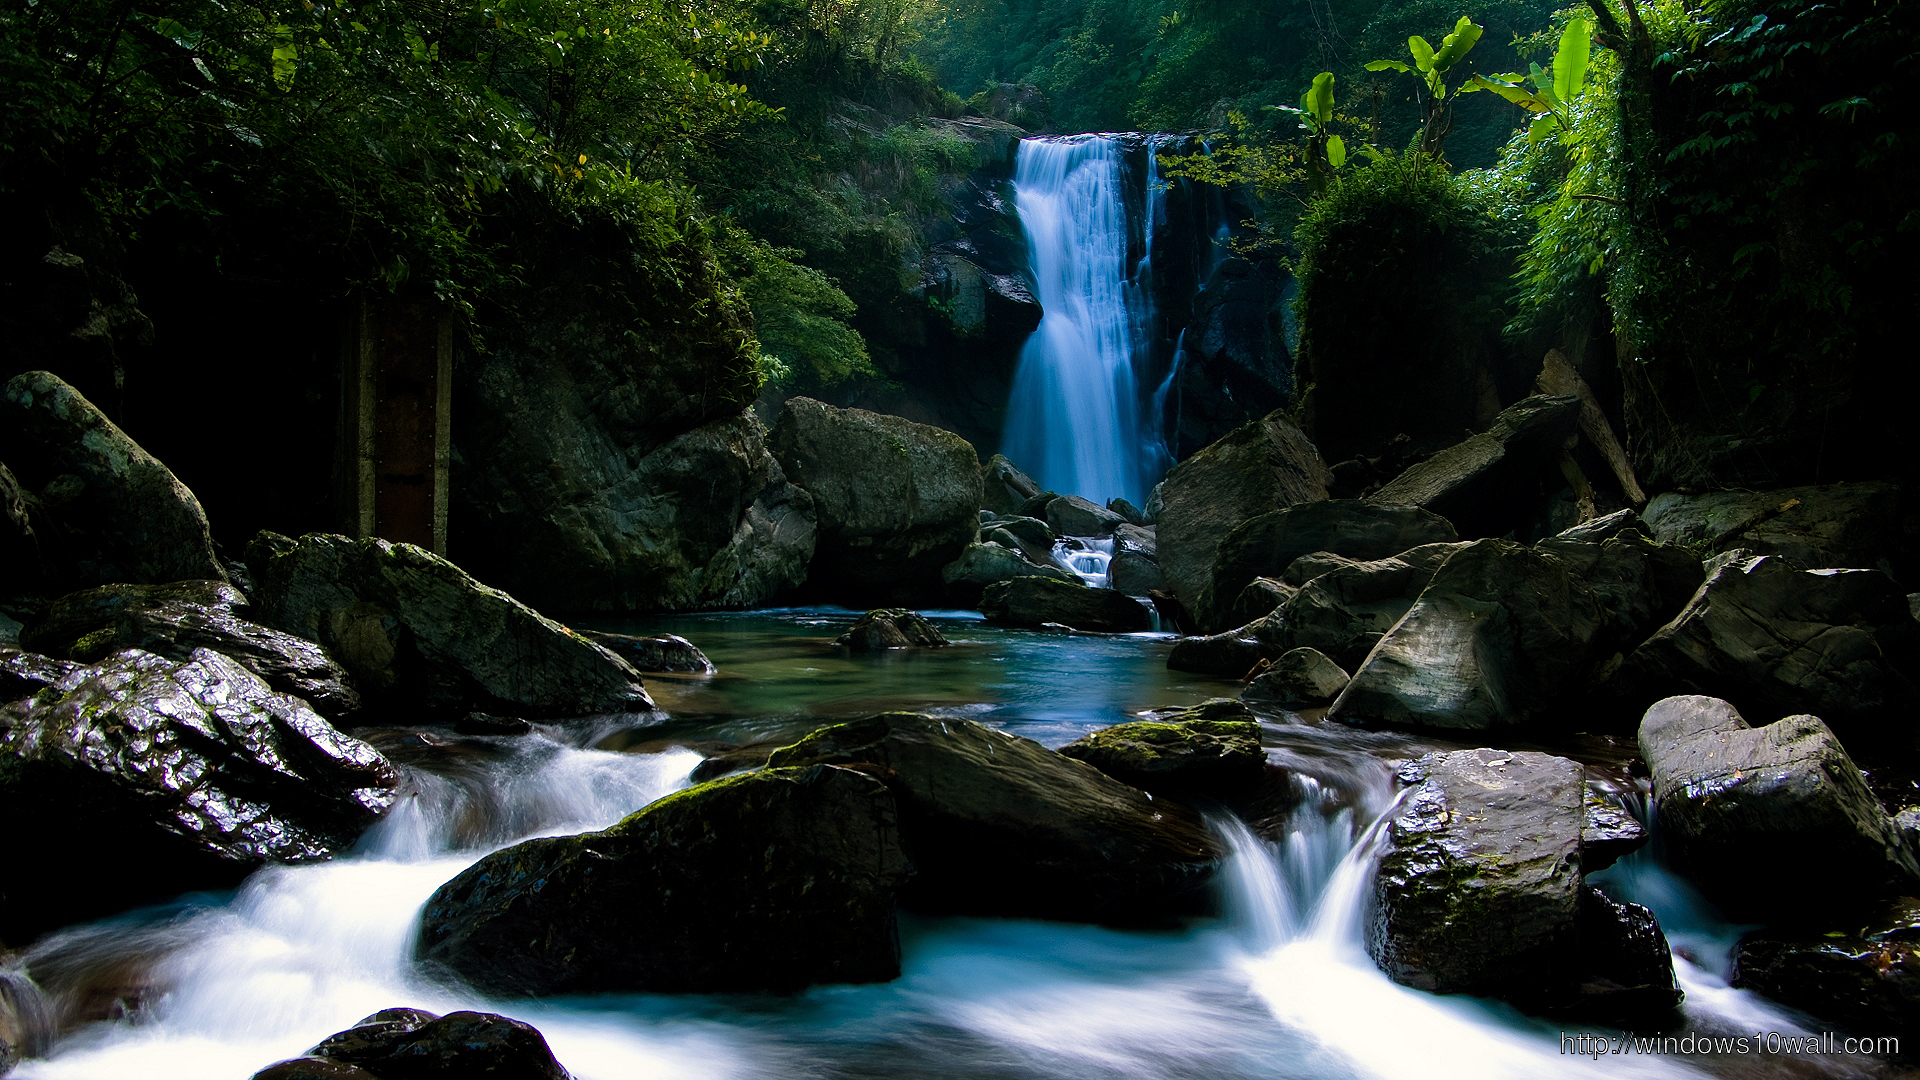 The Waterfall Wallpaper